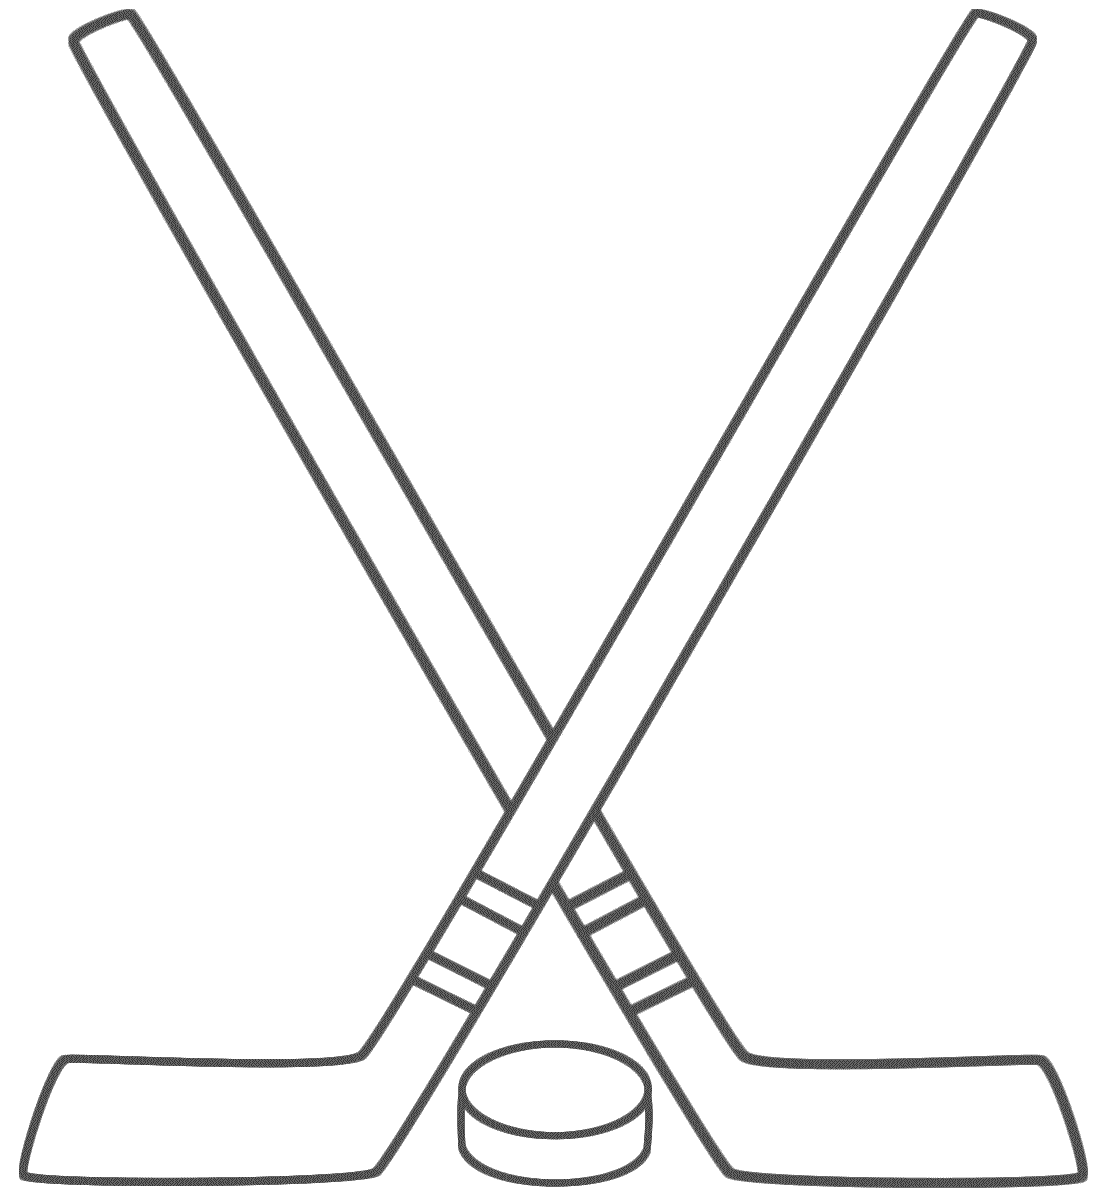 Pix For Hockey Sticks And Puck Clipart Hockey Stick Hockey Cakes Hockey Kids